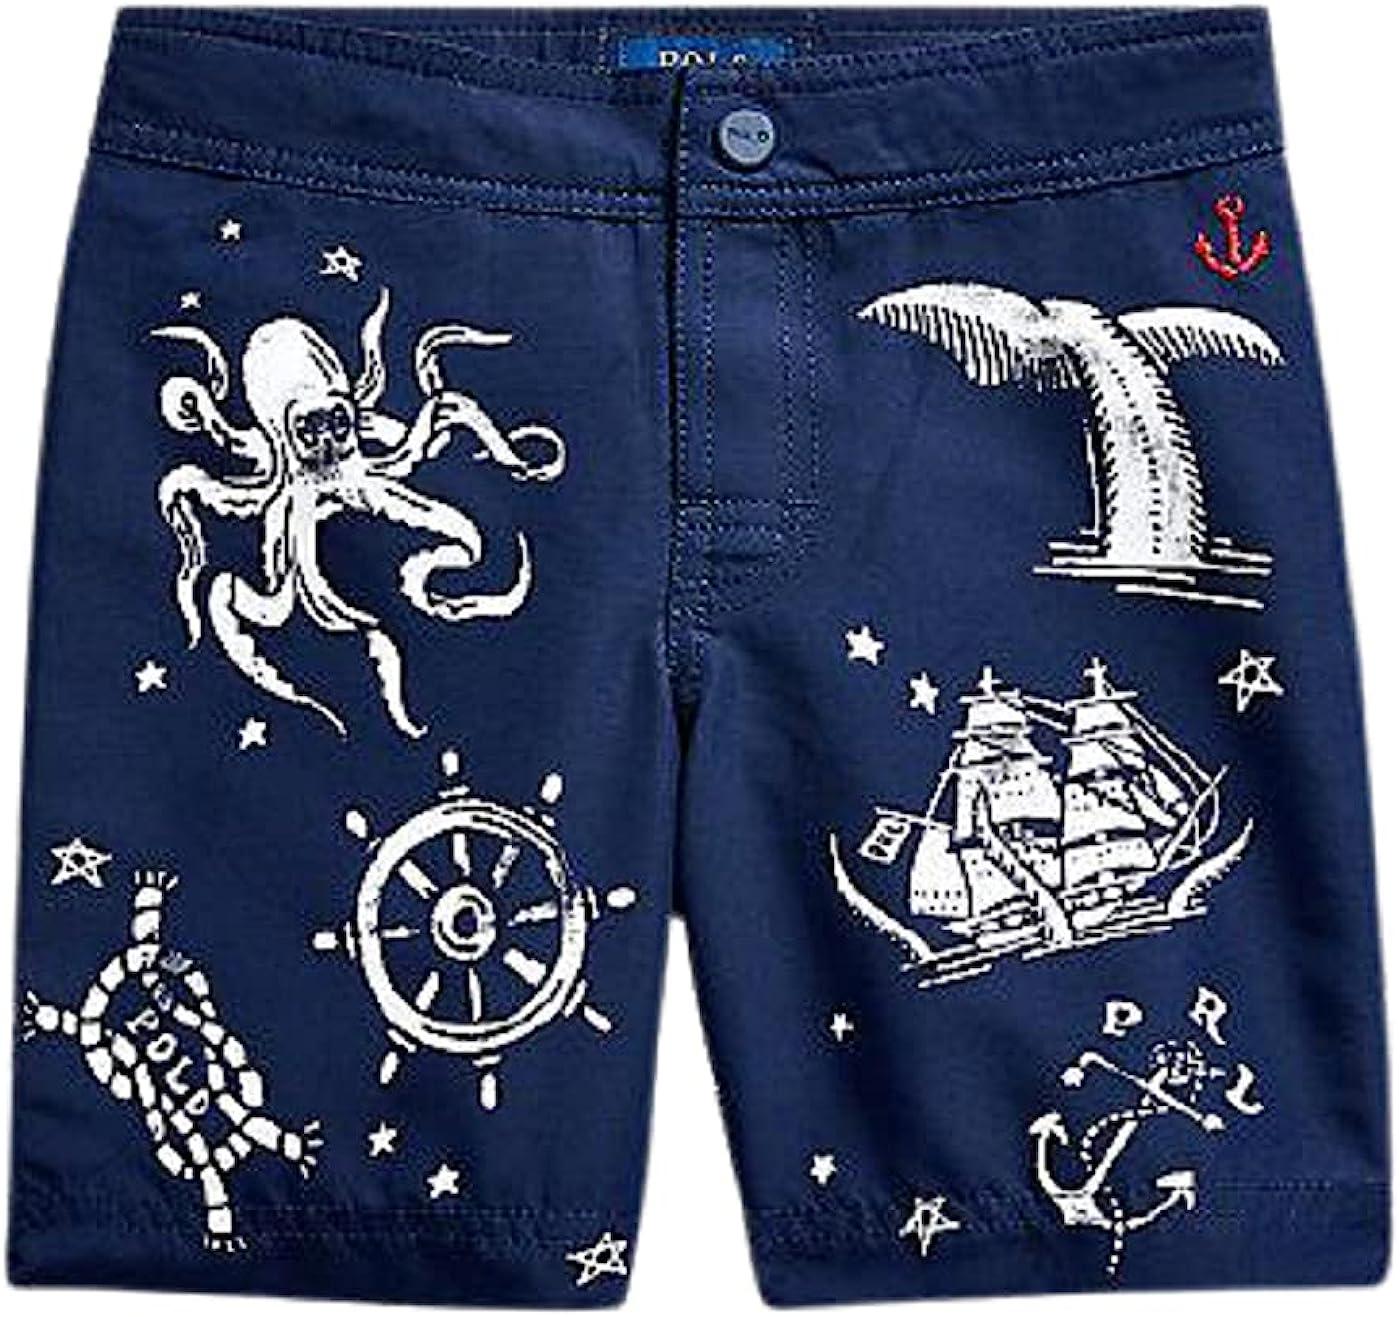 Polo Ralph Lauren French Navy Big Boys Nautical-Print Swim Trunks, US Small